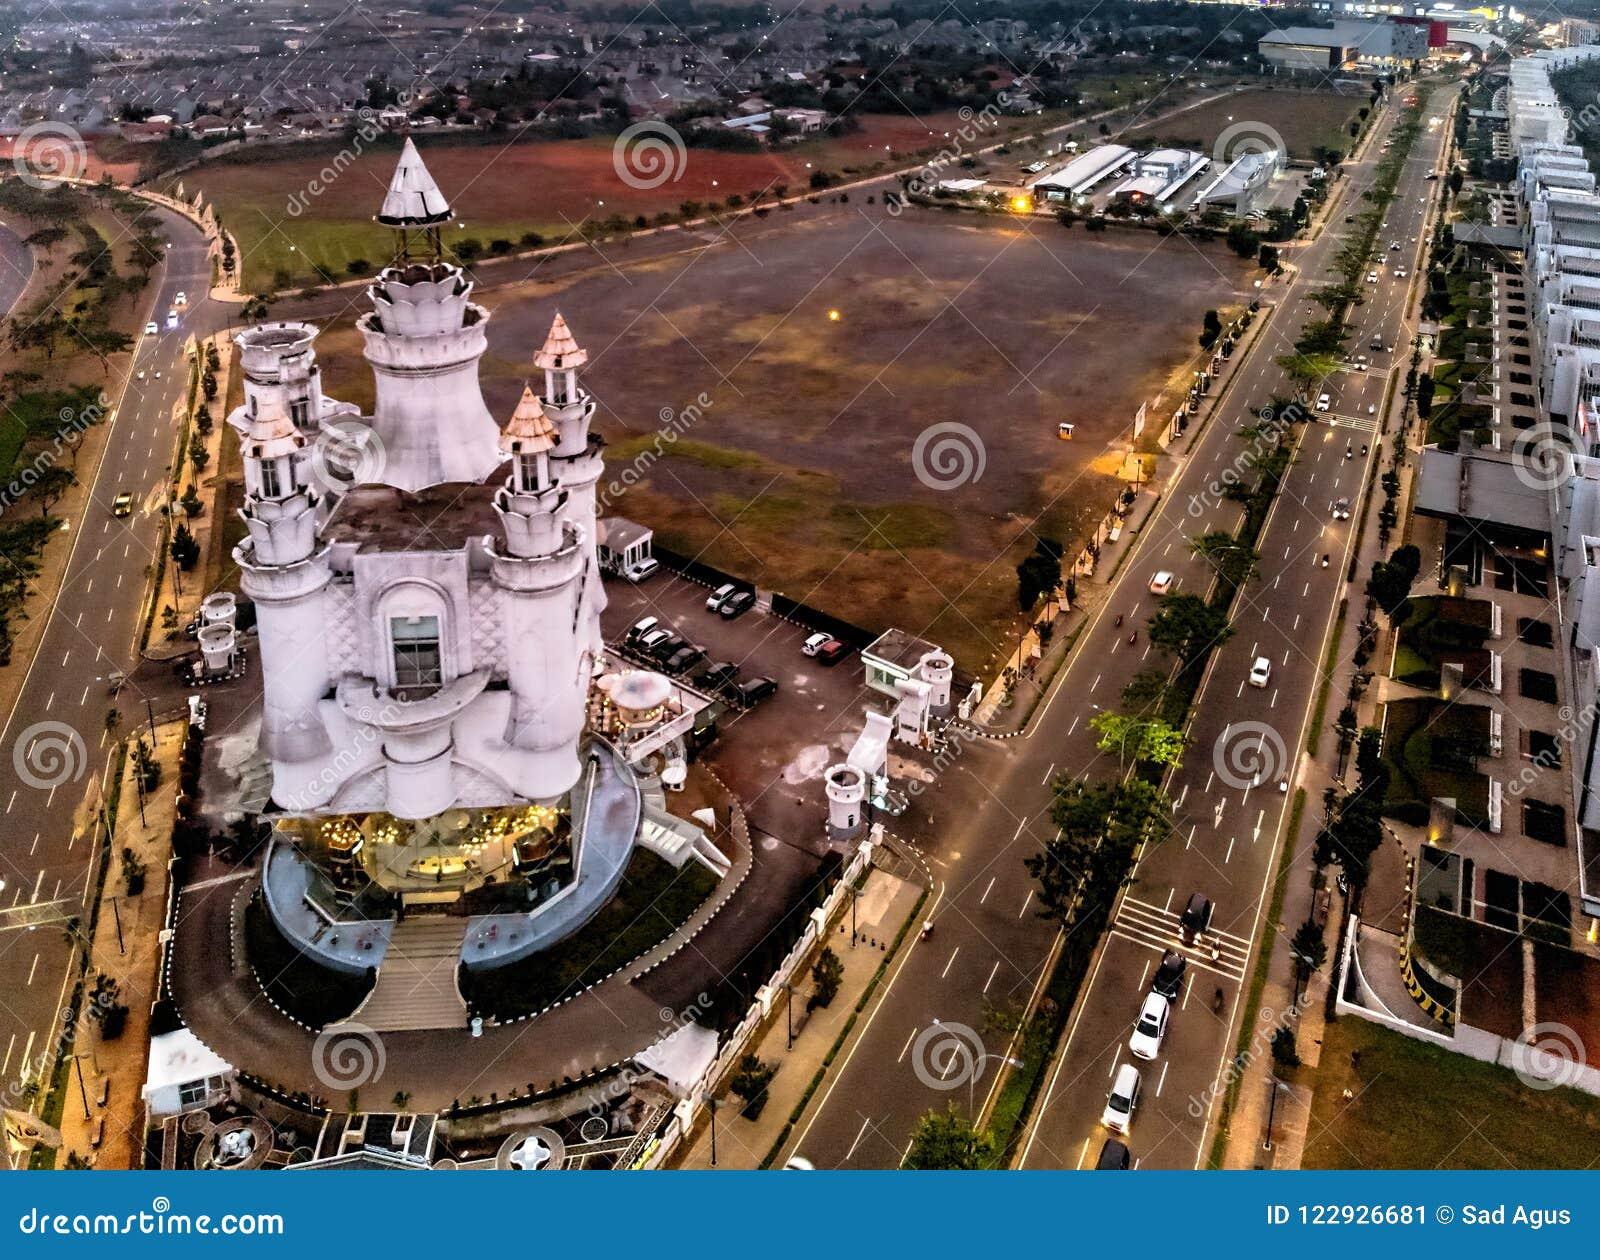 BSD Tangerang miasta widok z lotu ptaka, Indonezja Lipiec 2018